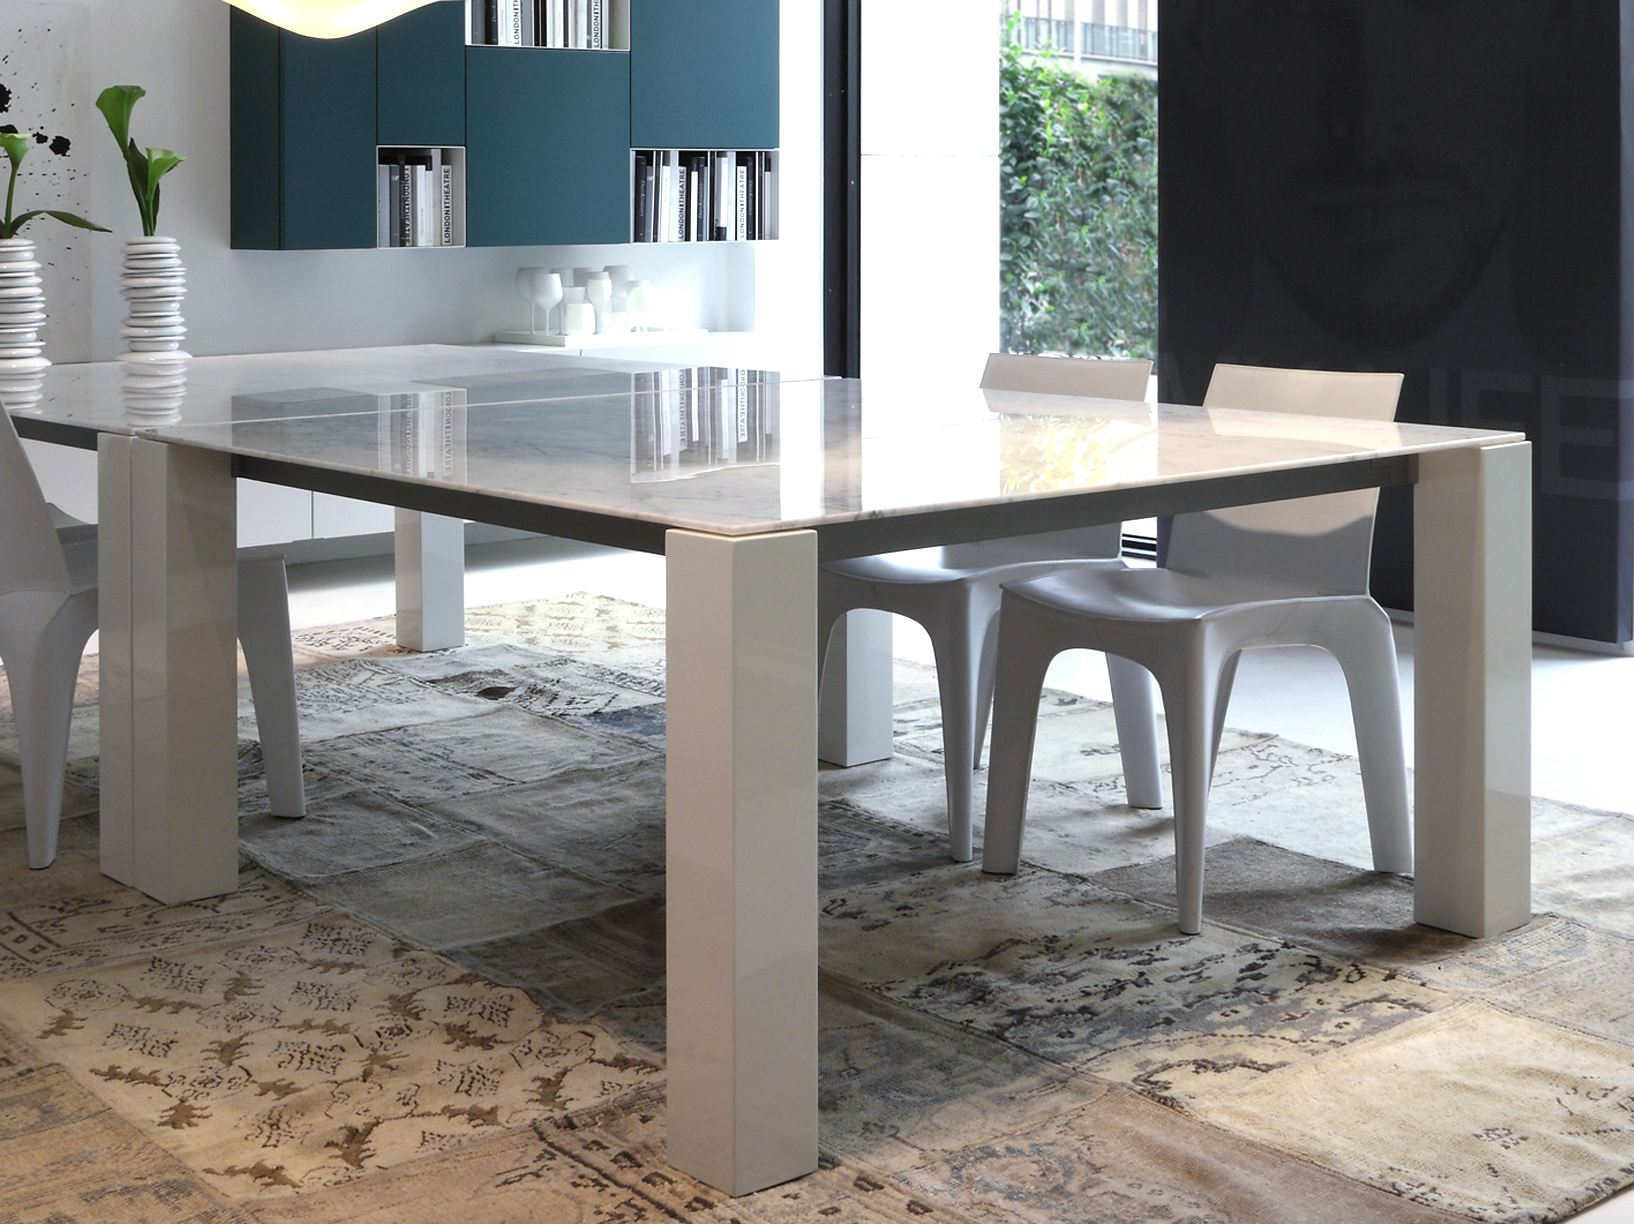 Tavoli Quadrati Moderni : Tavoli quadrati moderni higrelays